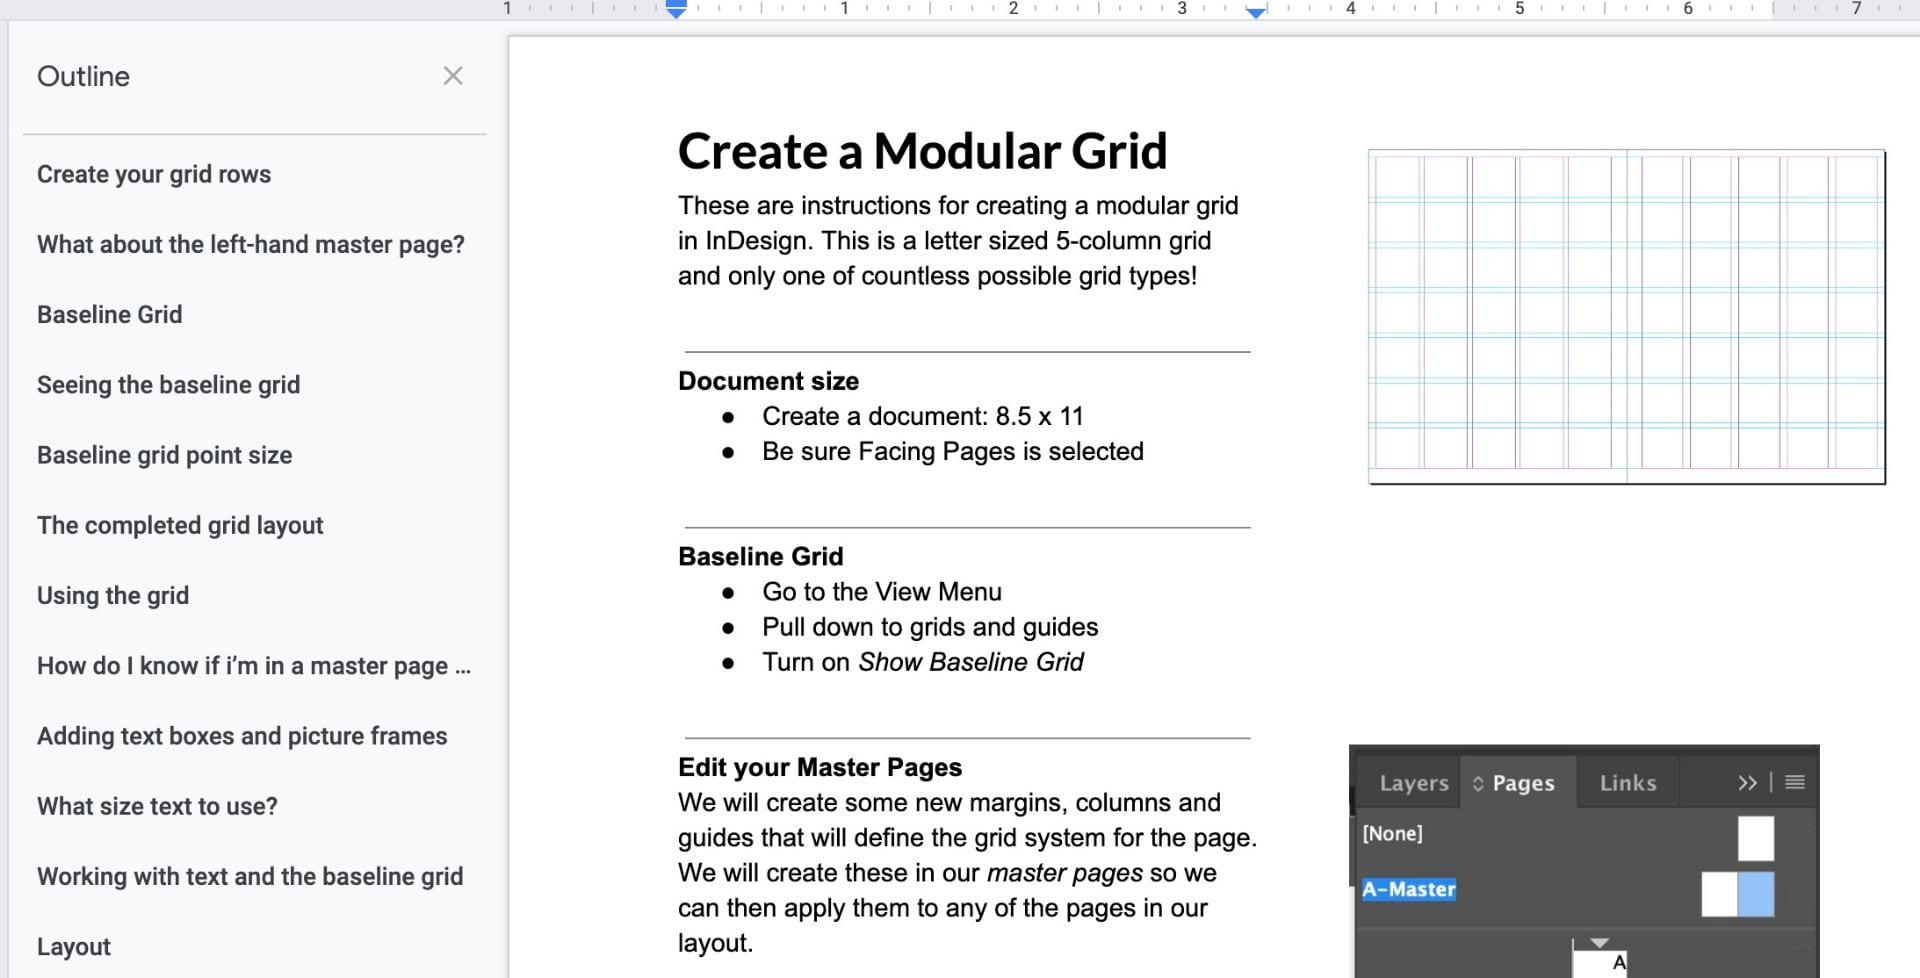 Create a modular grid in InDesign